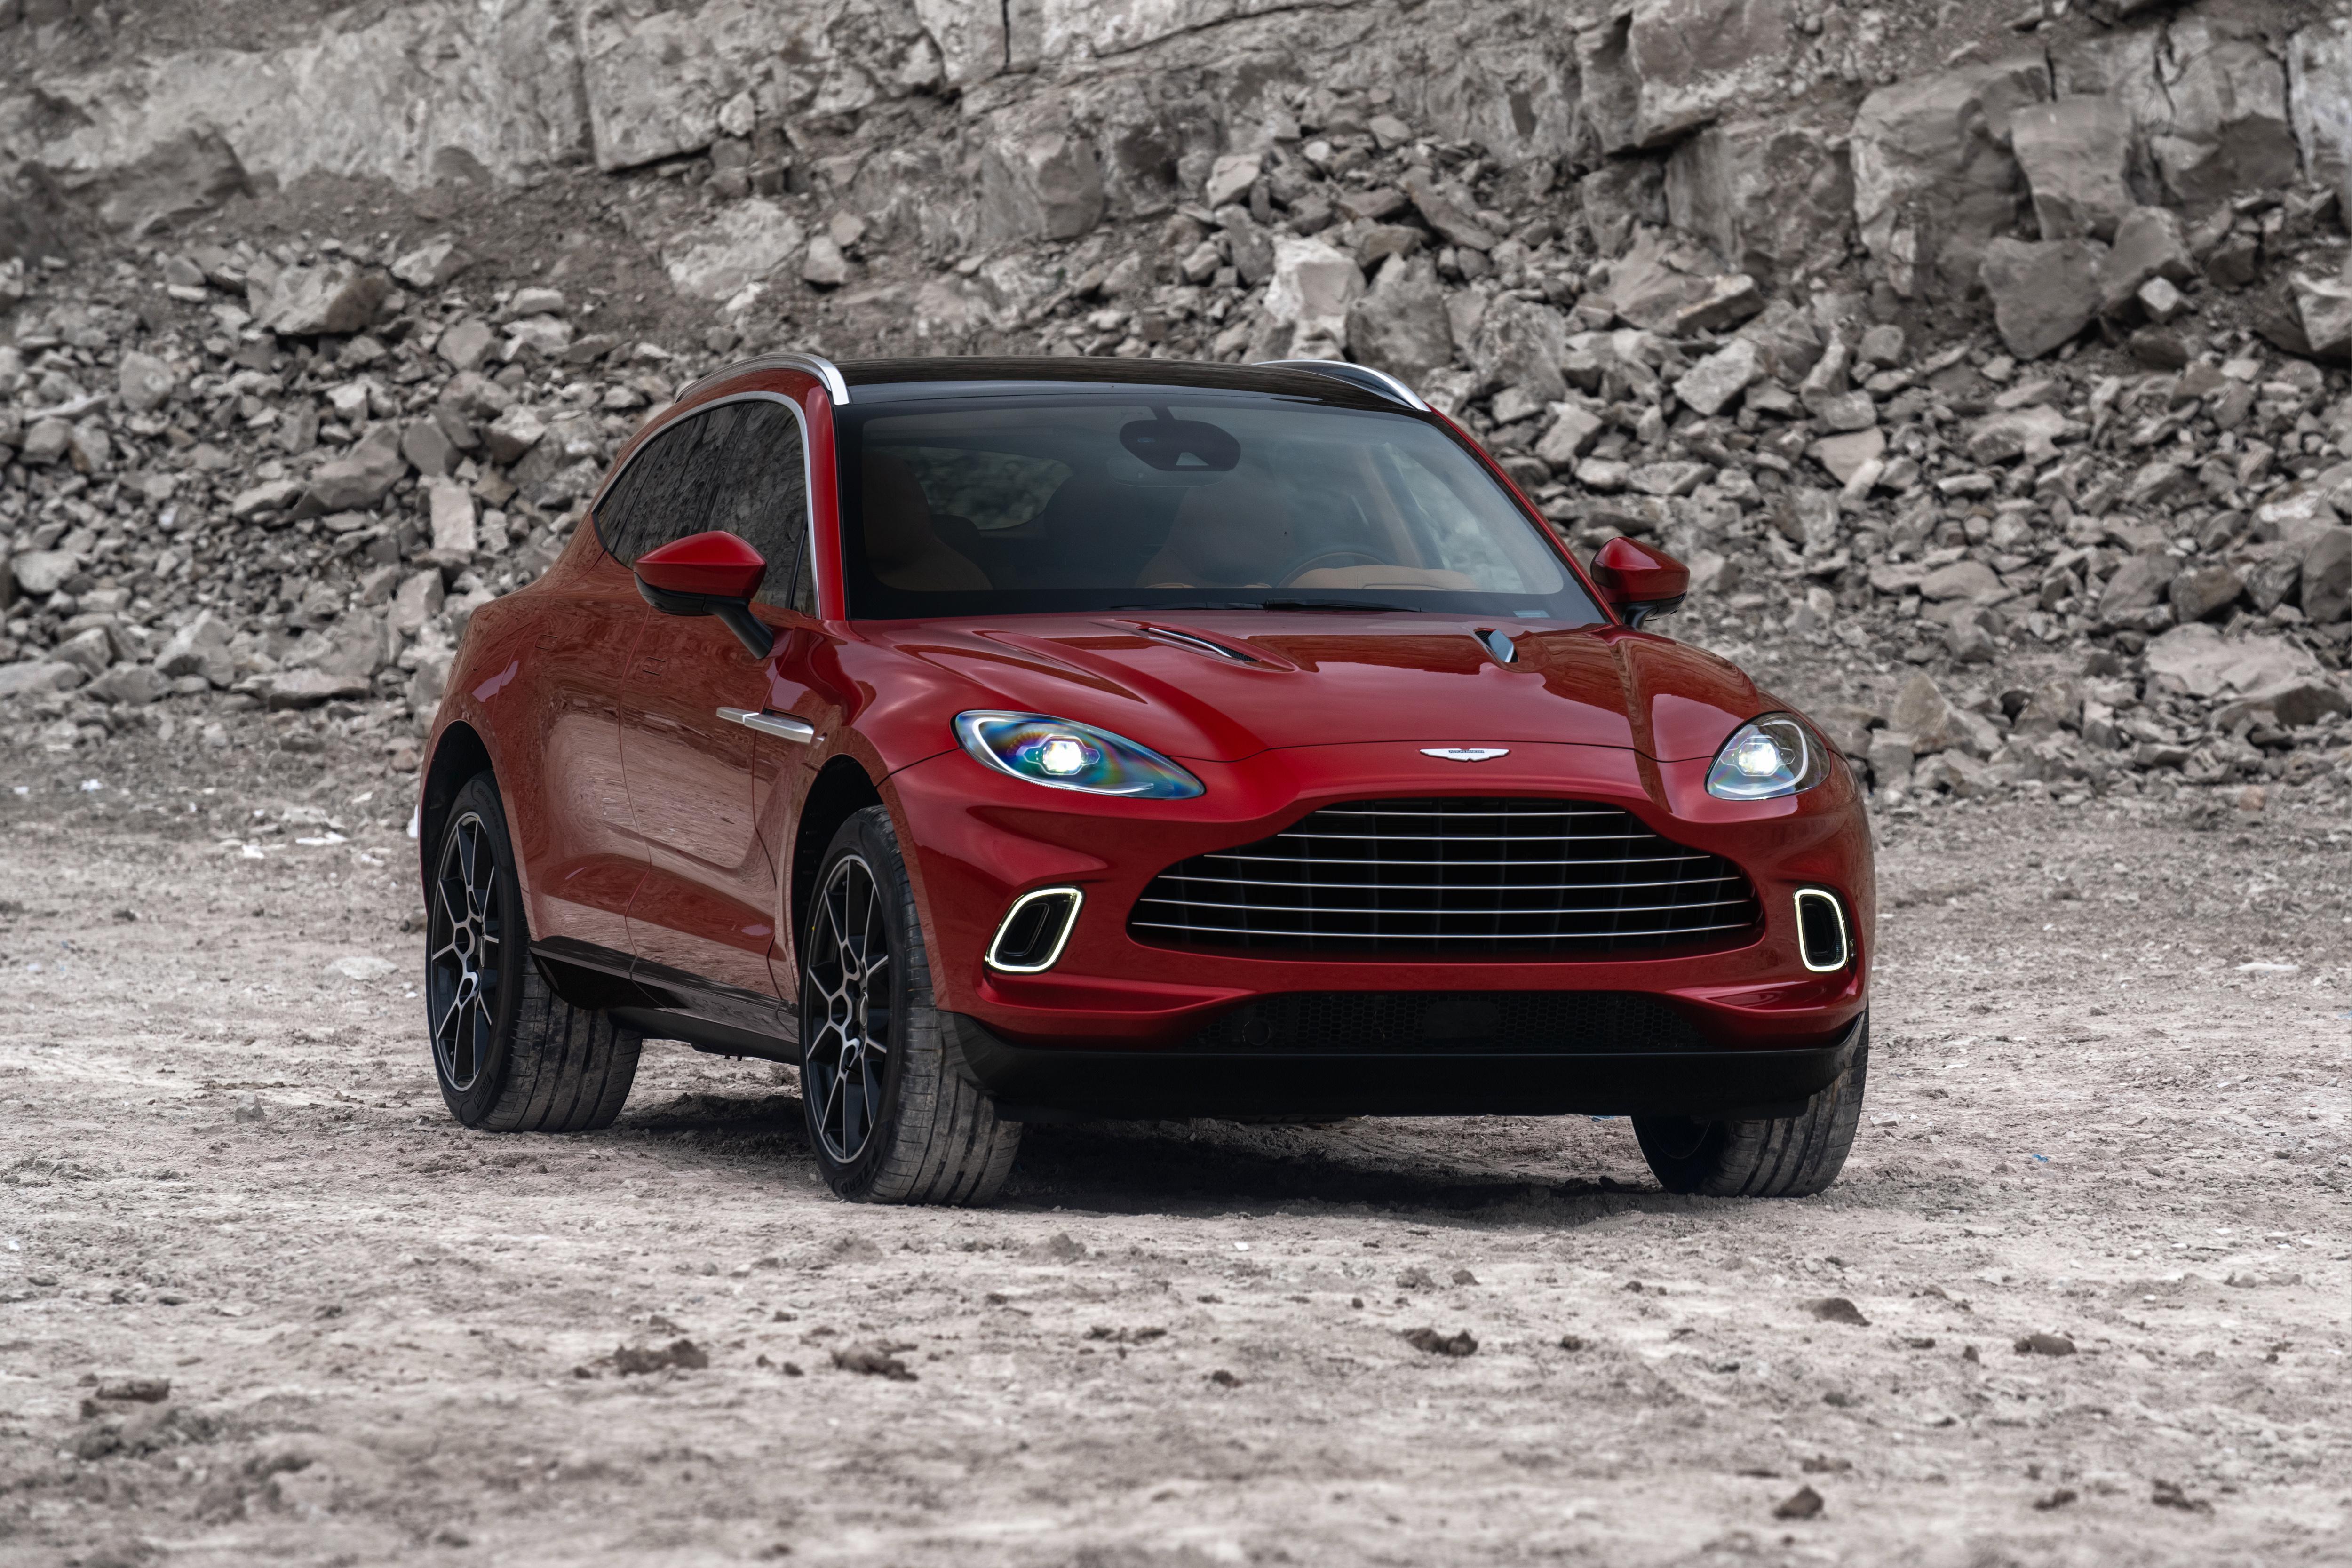 2020 Aston Martin Dbx 4k Ultra Papel De Parede Hd Plano De Fundo 5000x3333 Id 1052711 Wallpaper Abyss